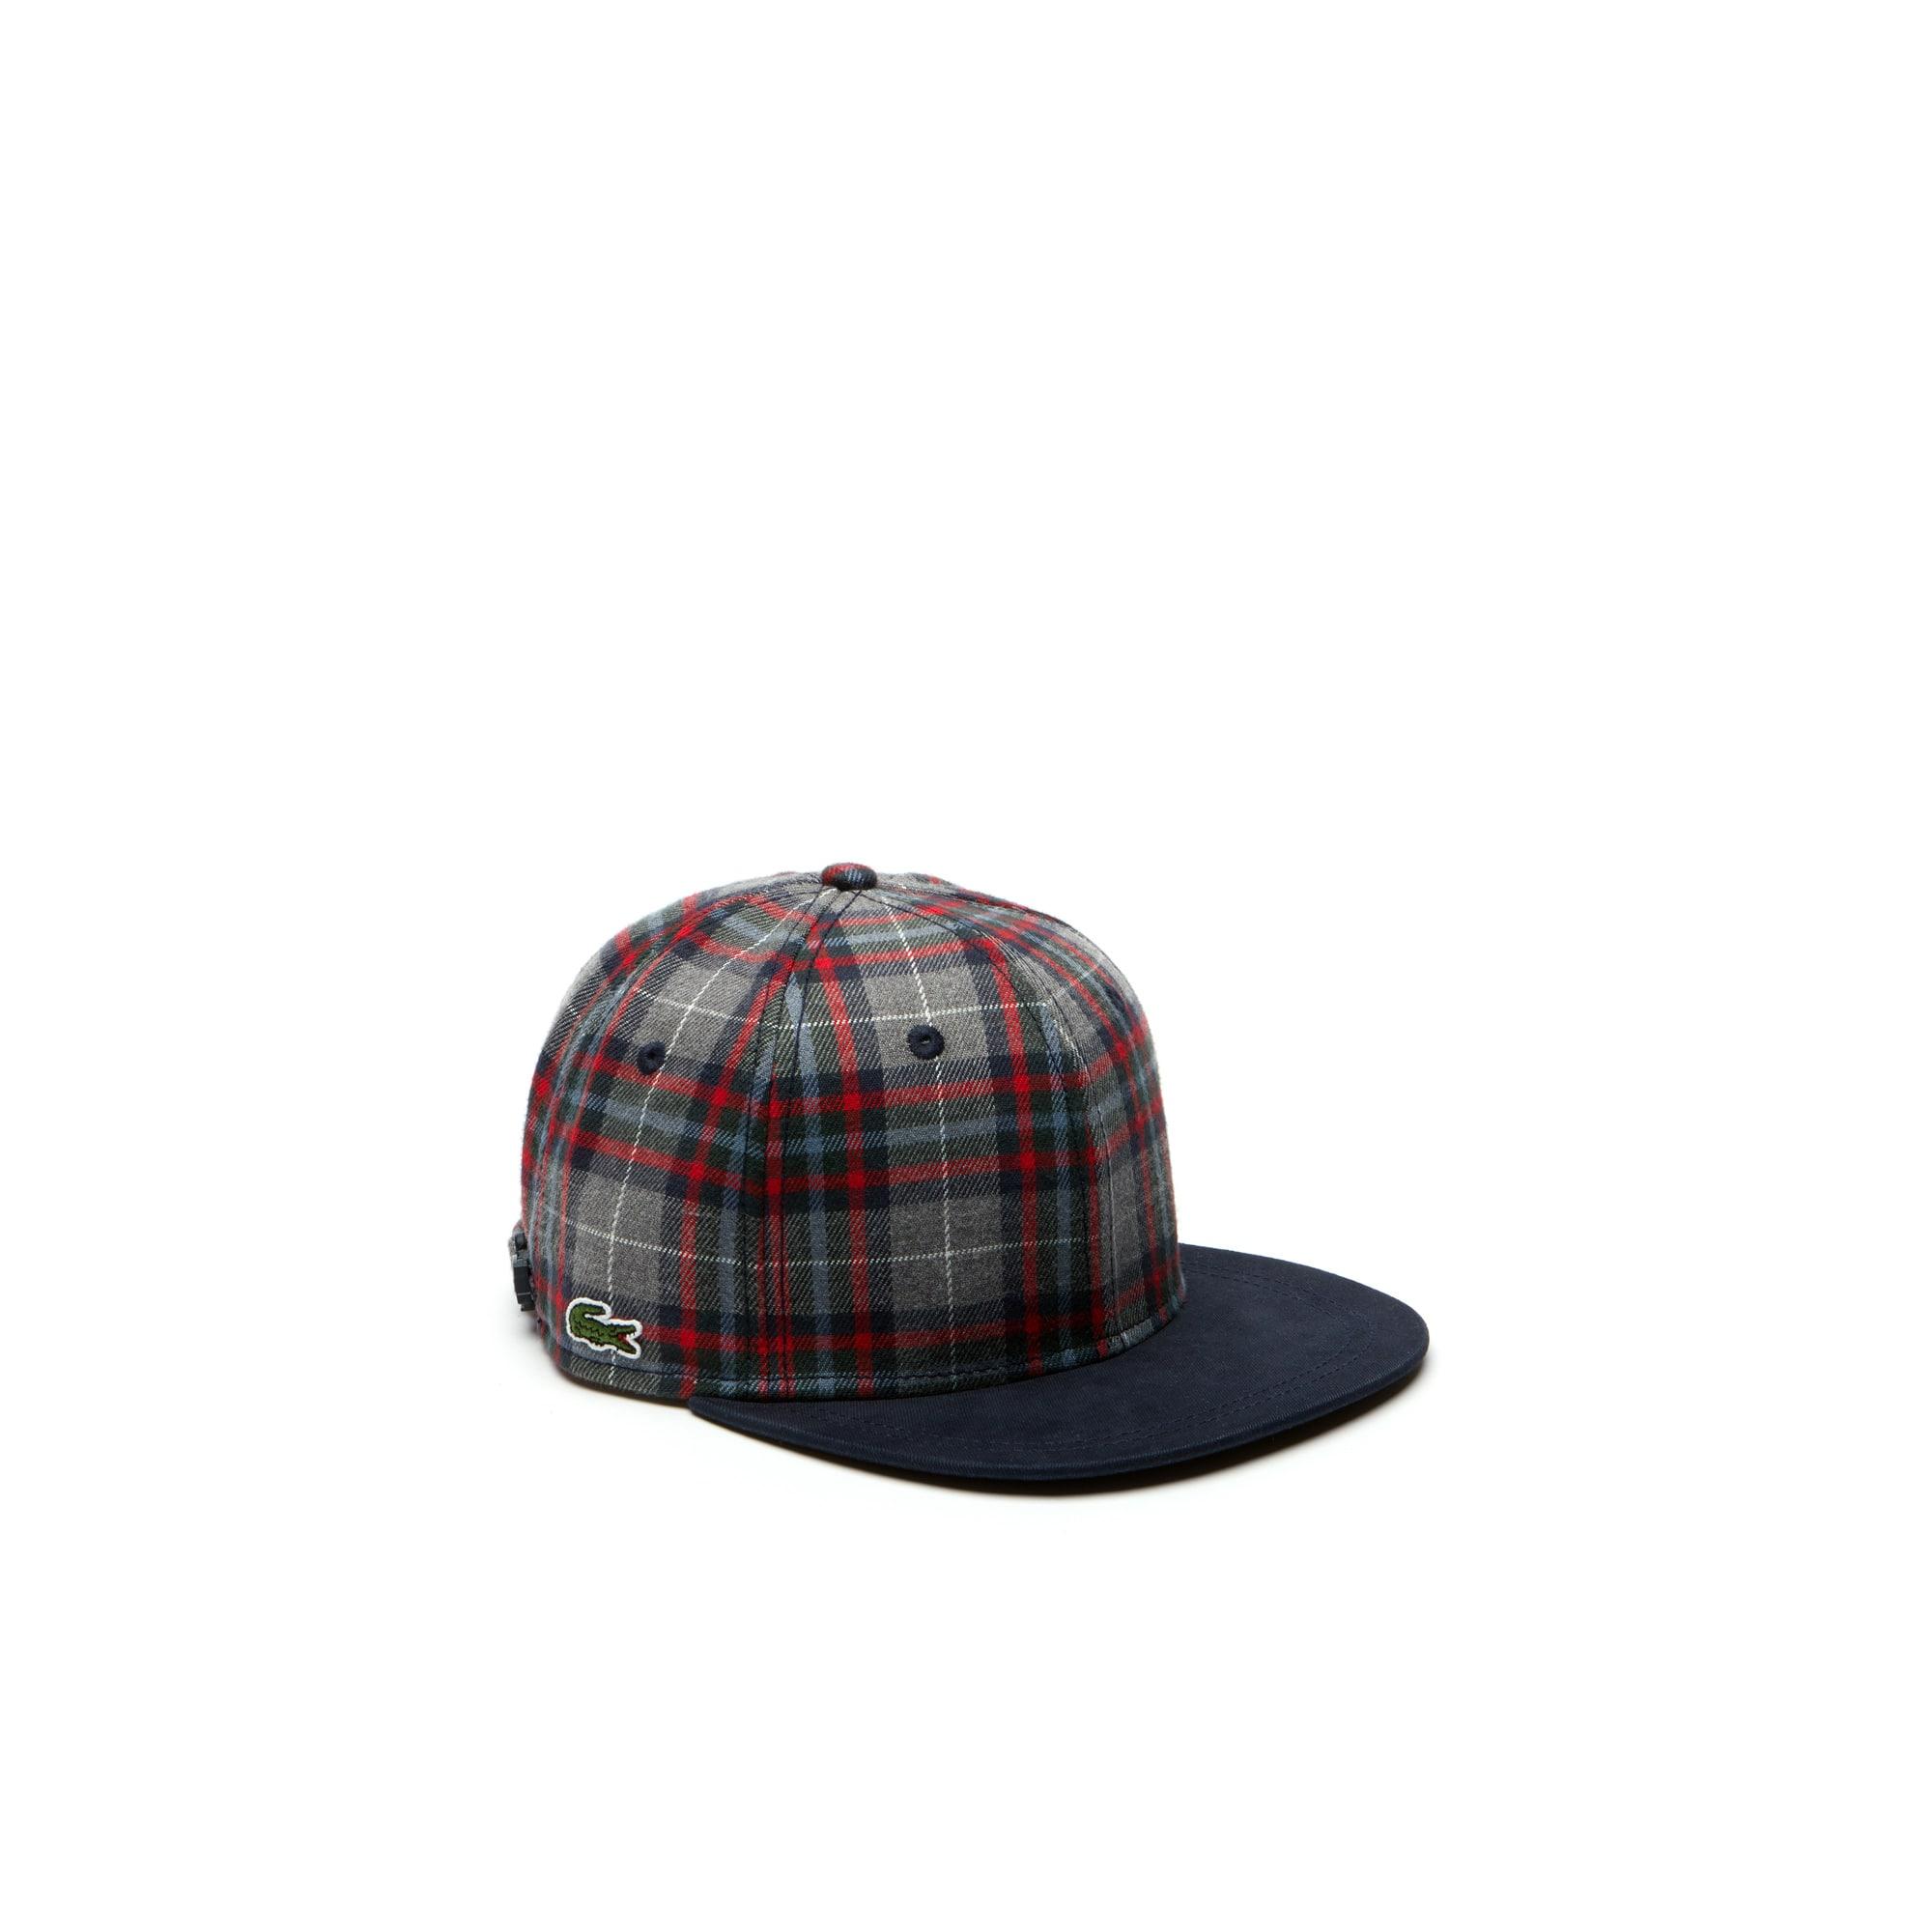 LIVE Contrasting Visor Check Flannel Cap